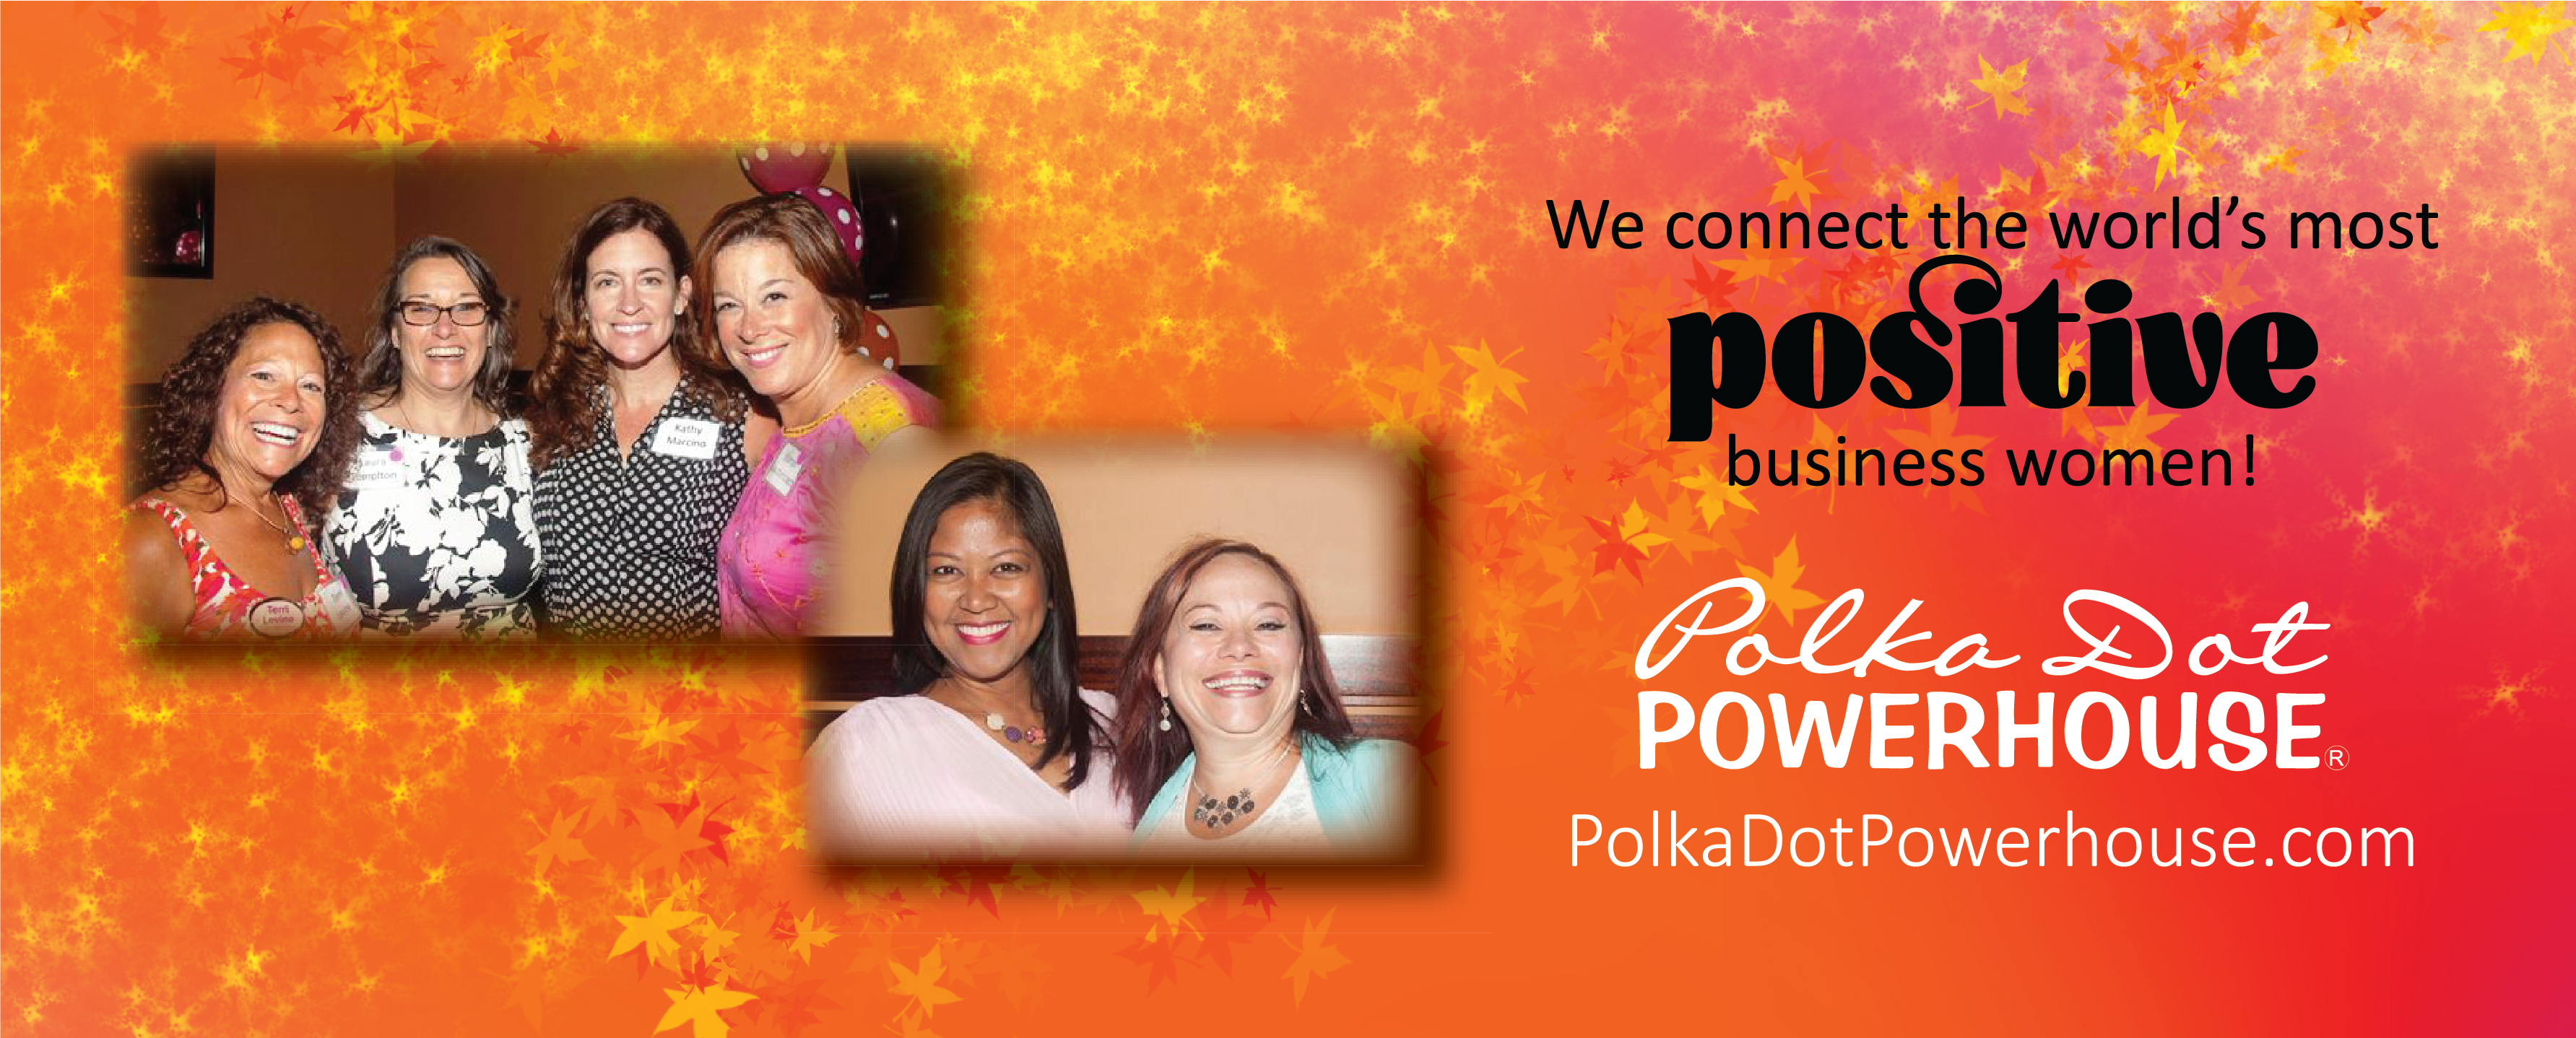 Polka Dot Powerhouse - Pottsgrove